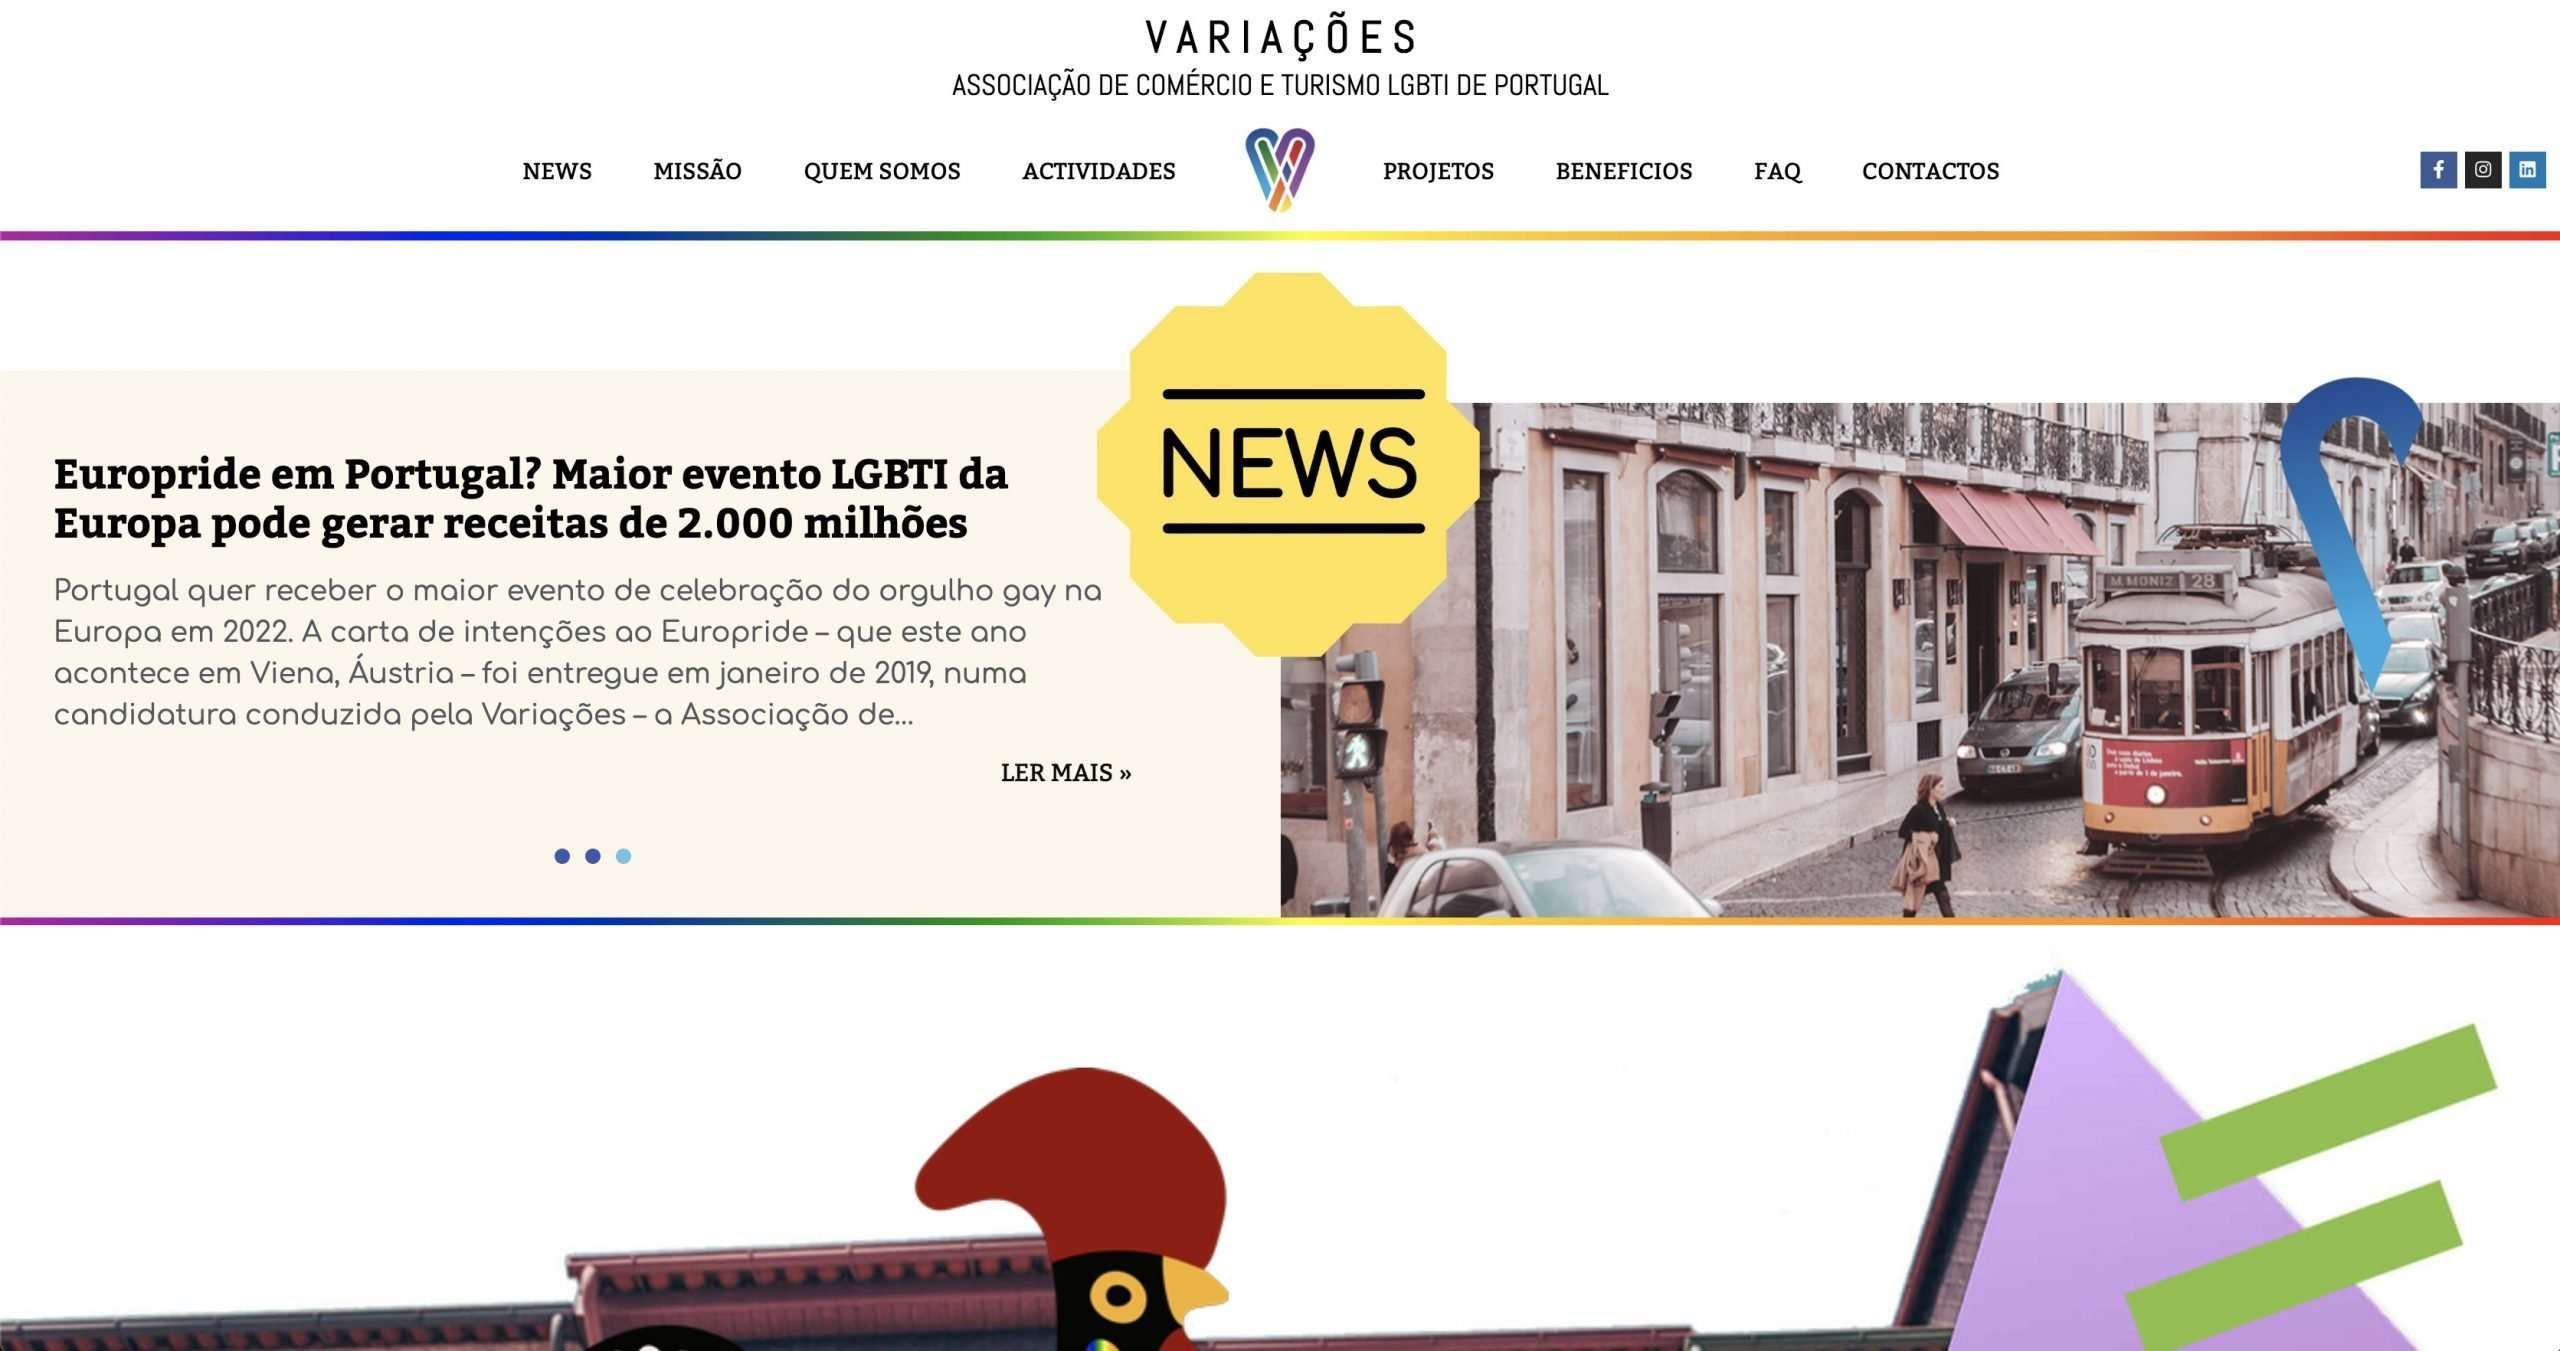 variacoes-online-lab-lisbon-web-development-web-digital-marketing-agency-design-1